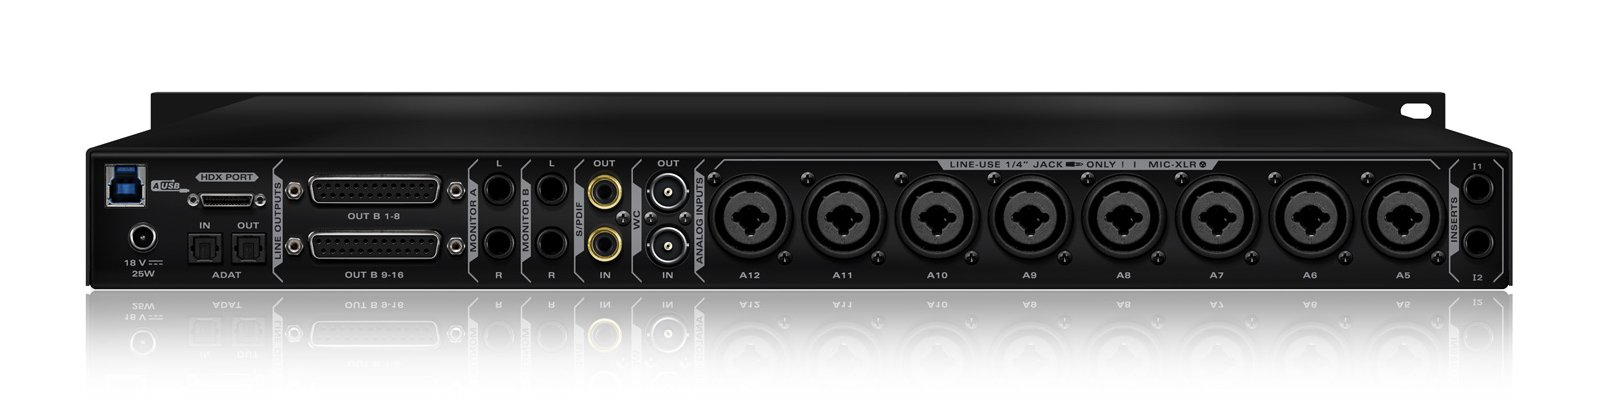 Thunderbolt/ USB Audio Interface